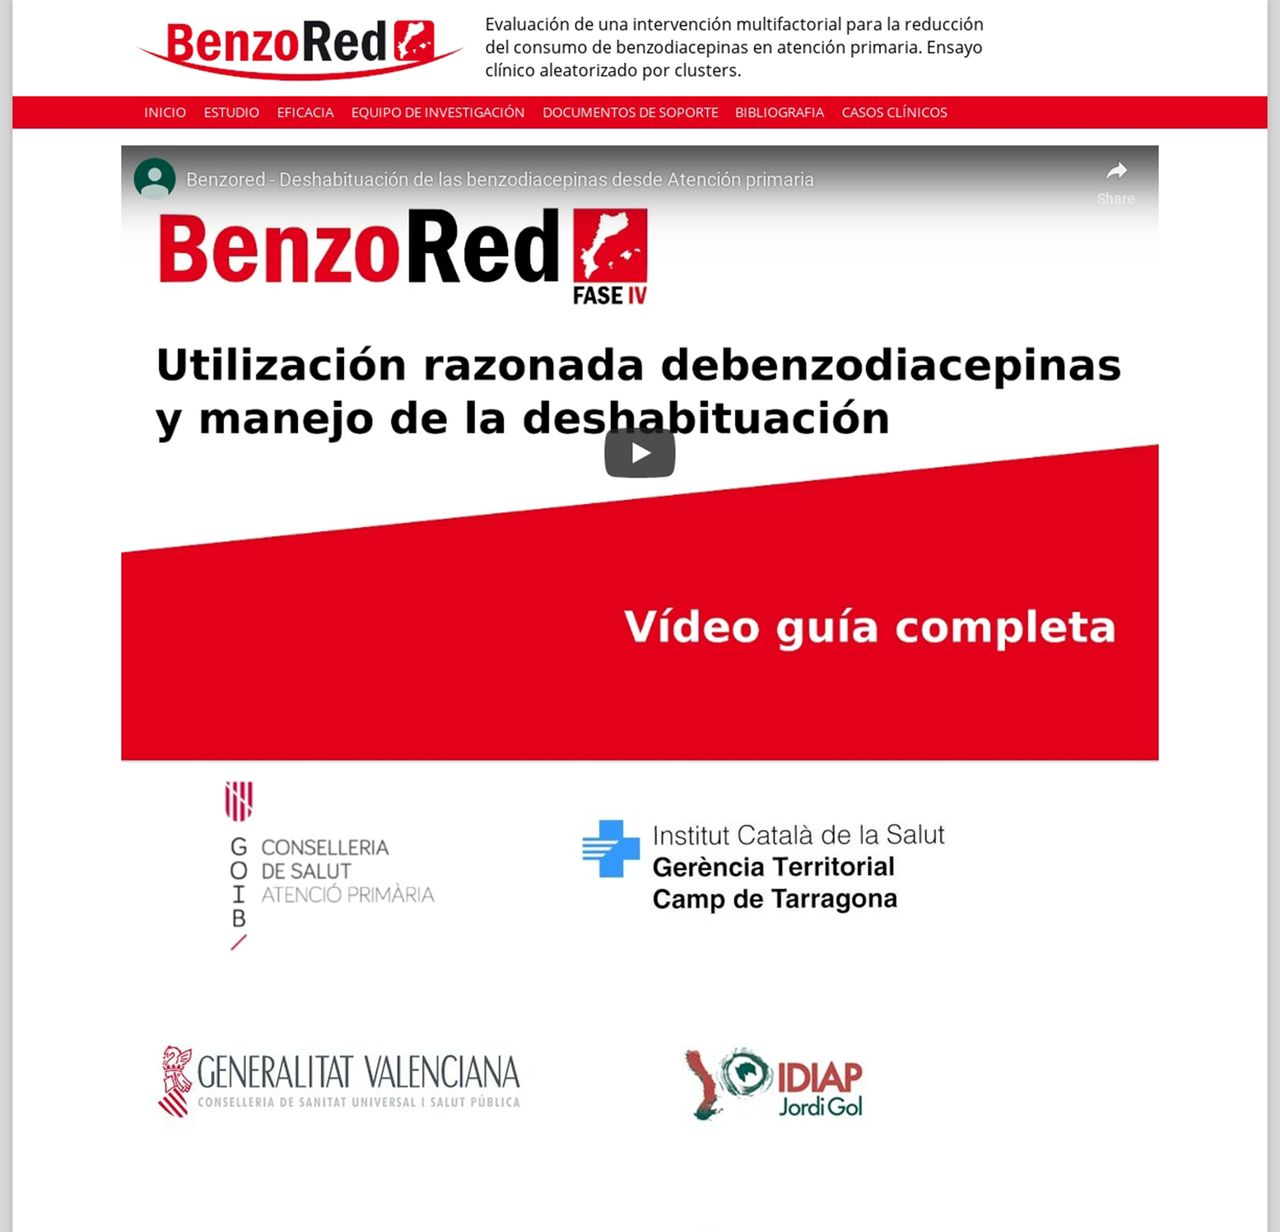 Intervention to reduce benzodiazepine prescriptions in